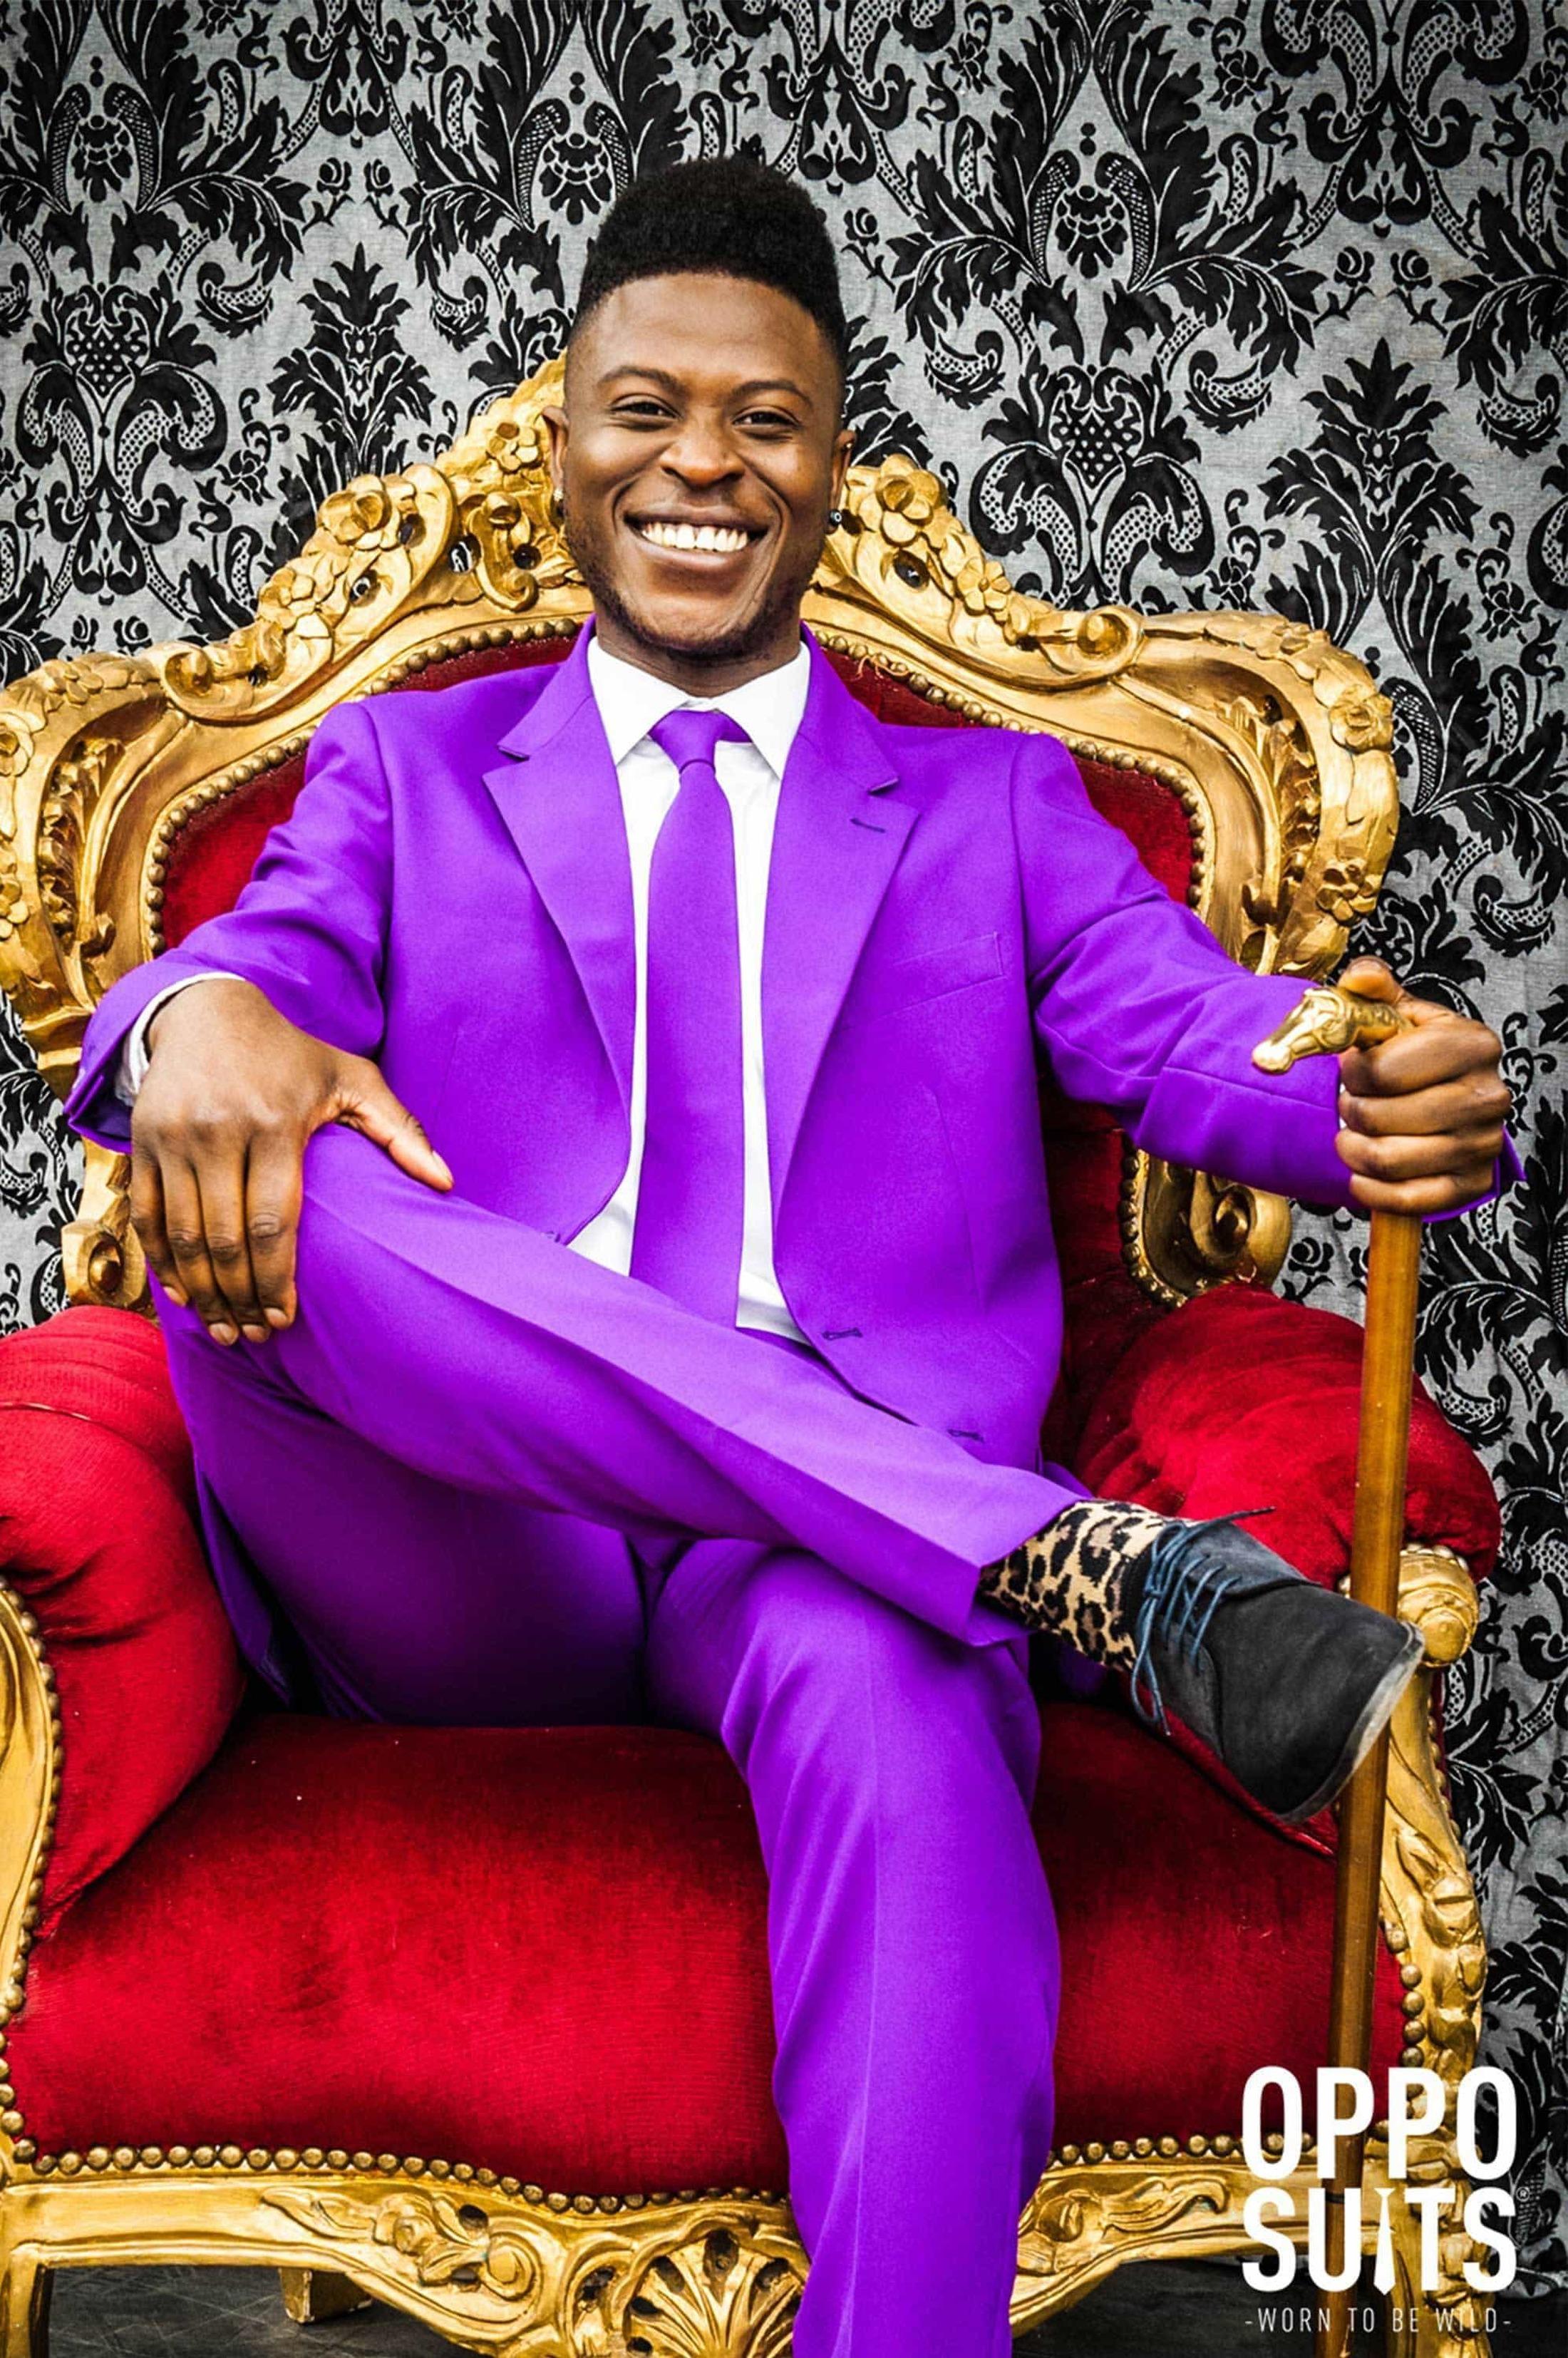 OppoSuits Purple Prince Suit foto 2